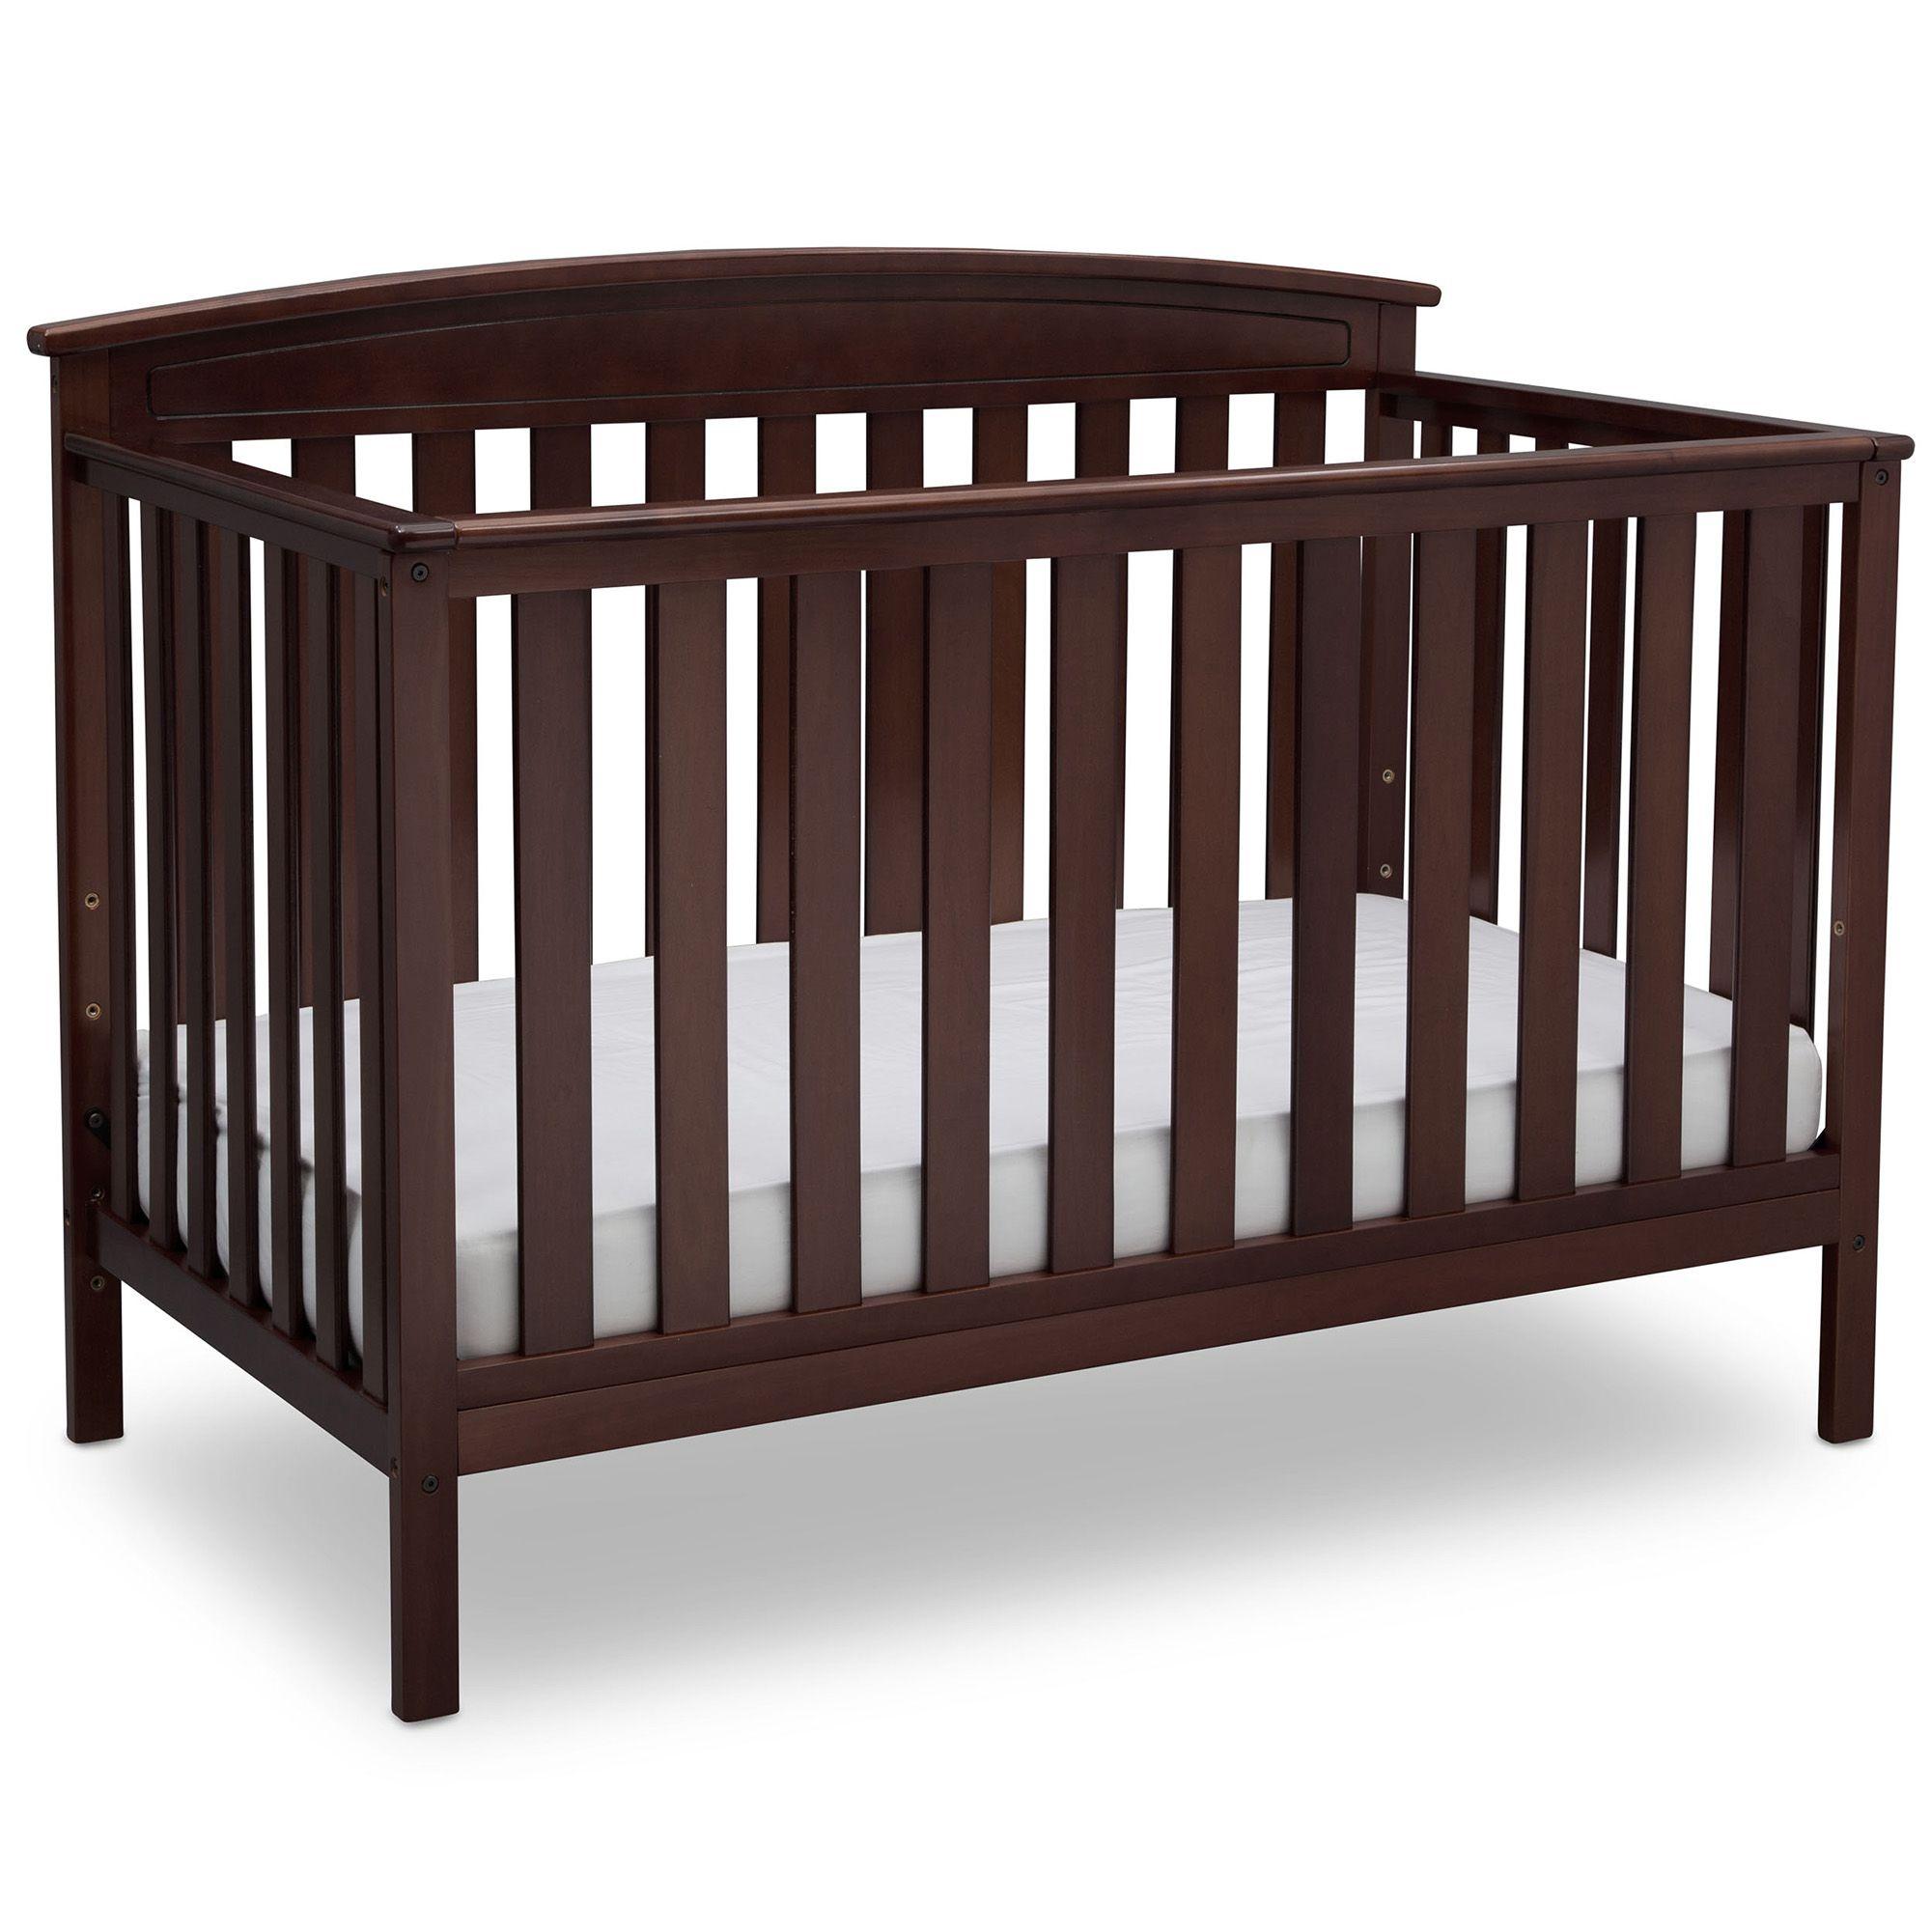 Baby Delta Children Baby Cribs Convertible Convertible Crib